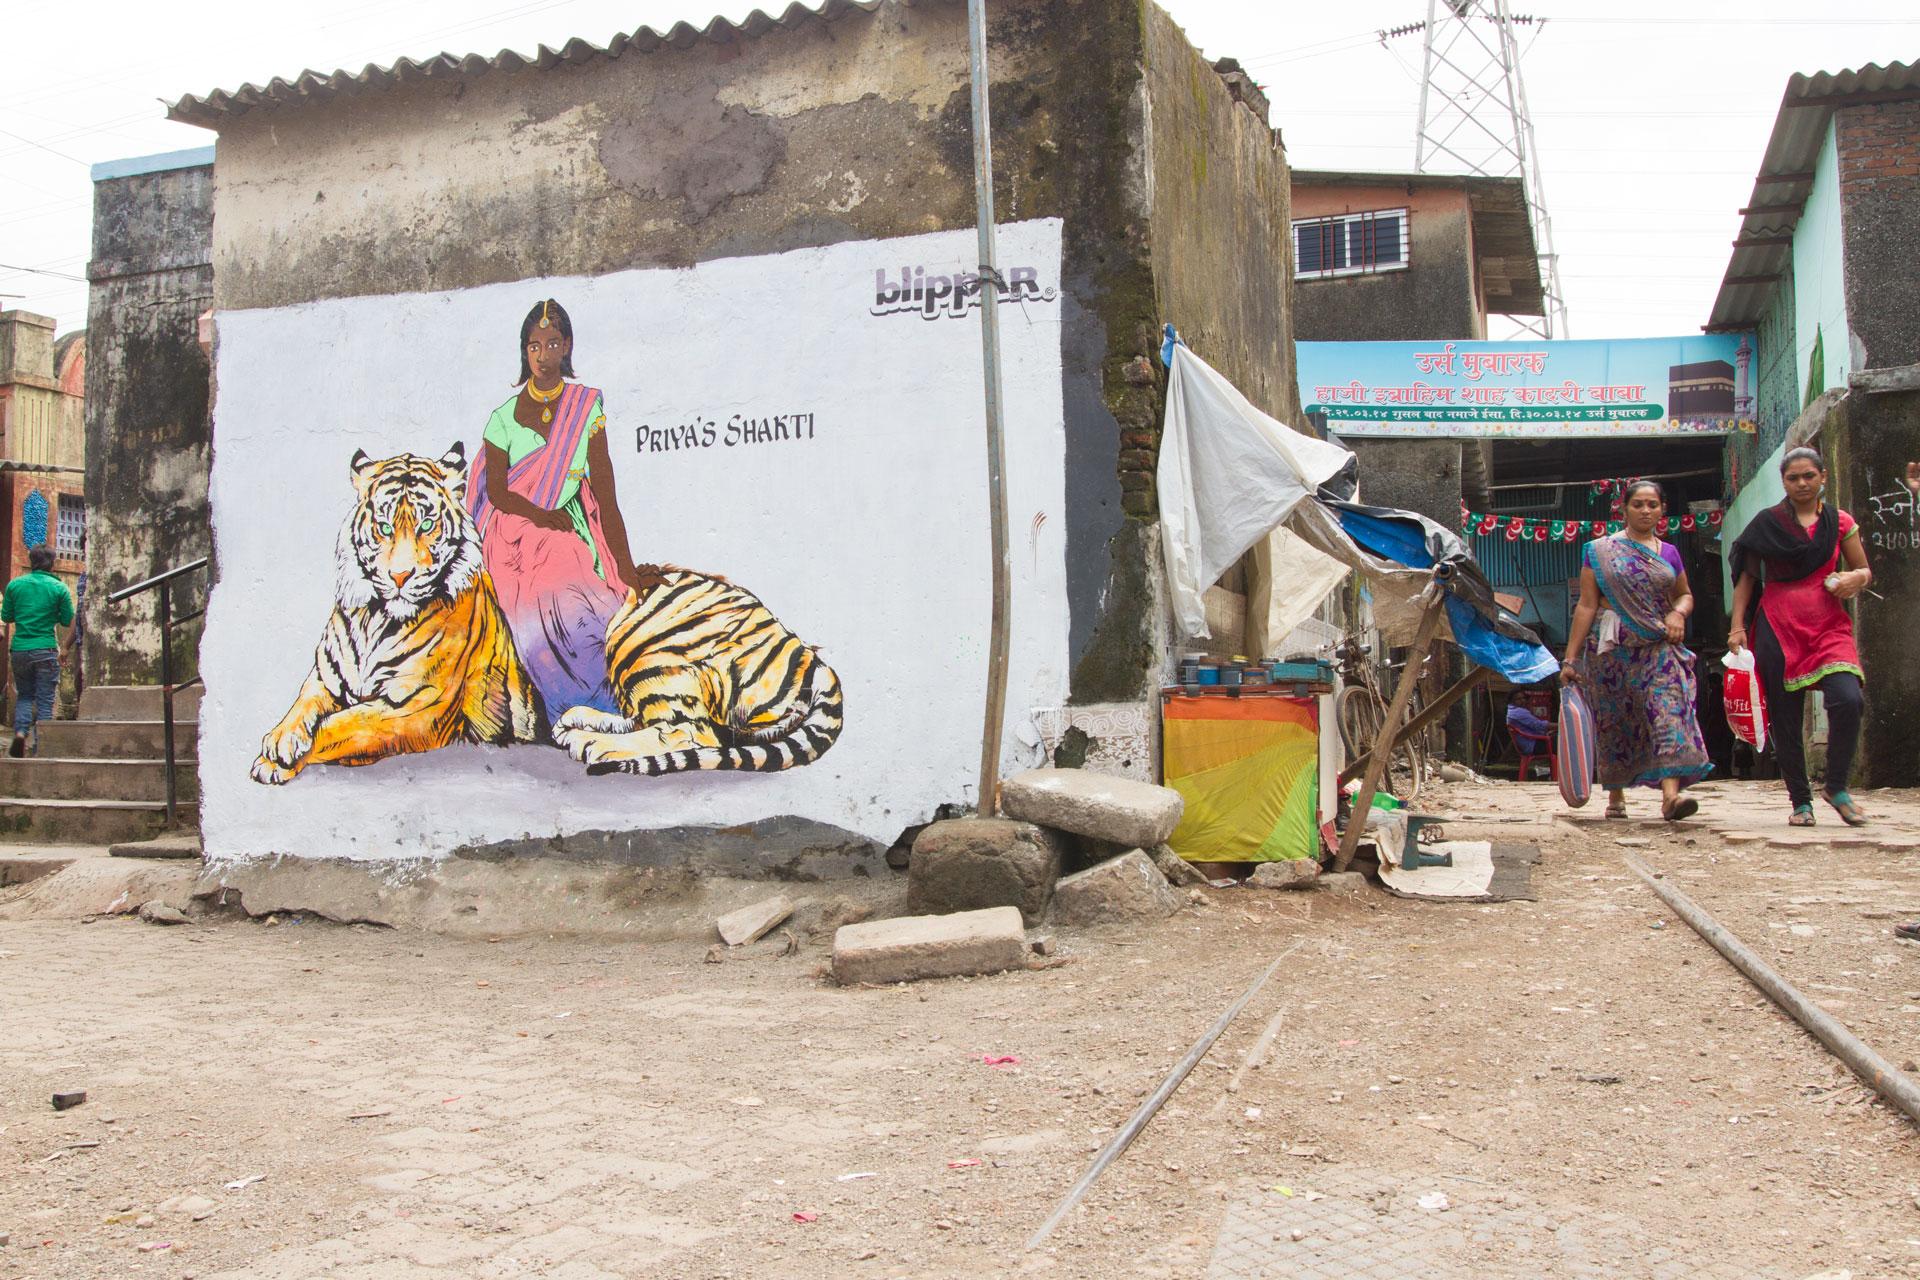 India_street_mural.jpg